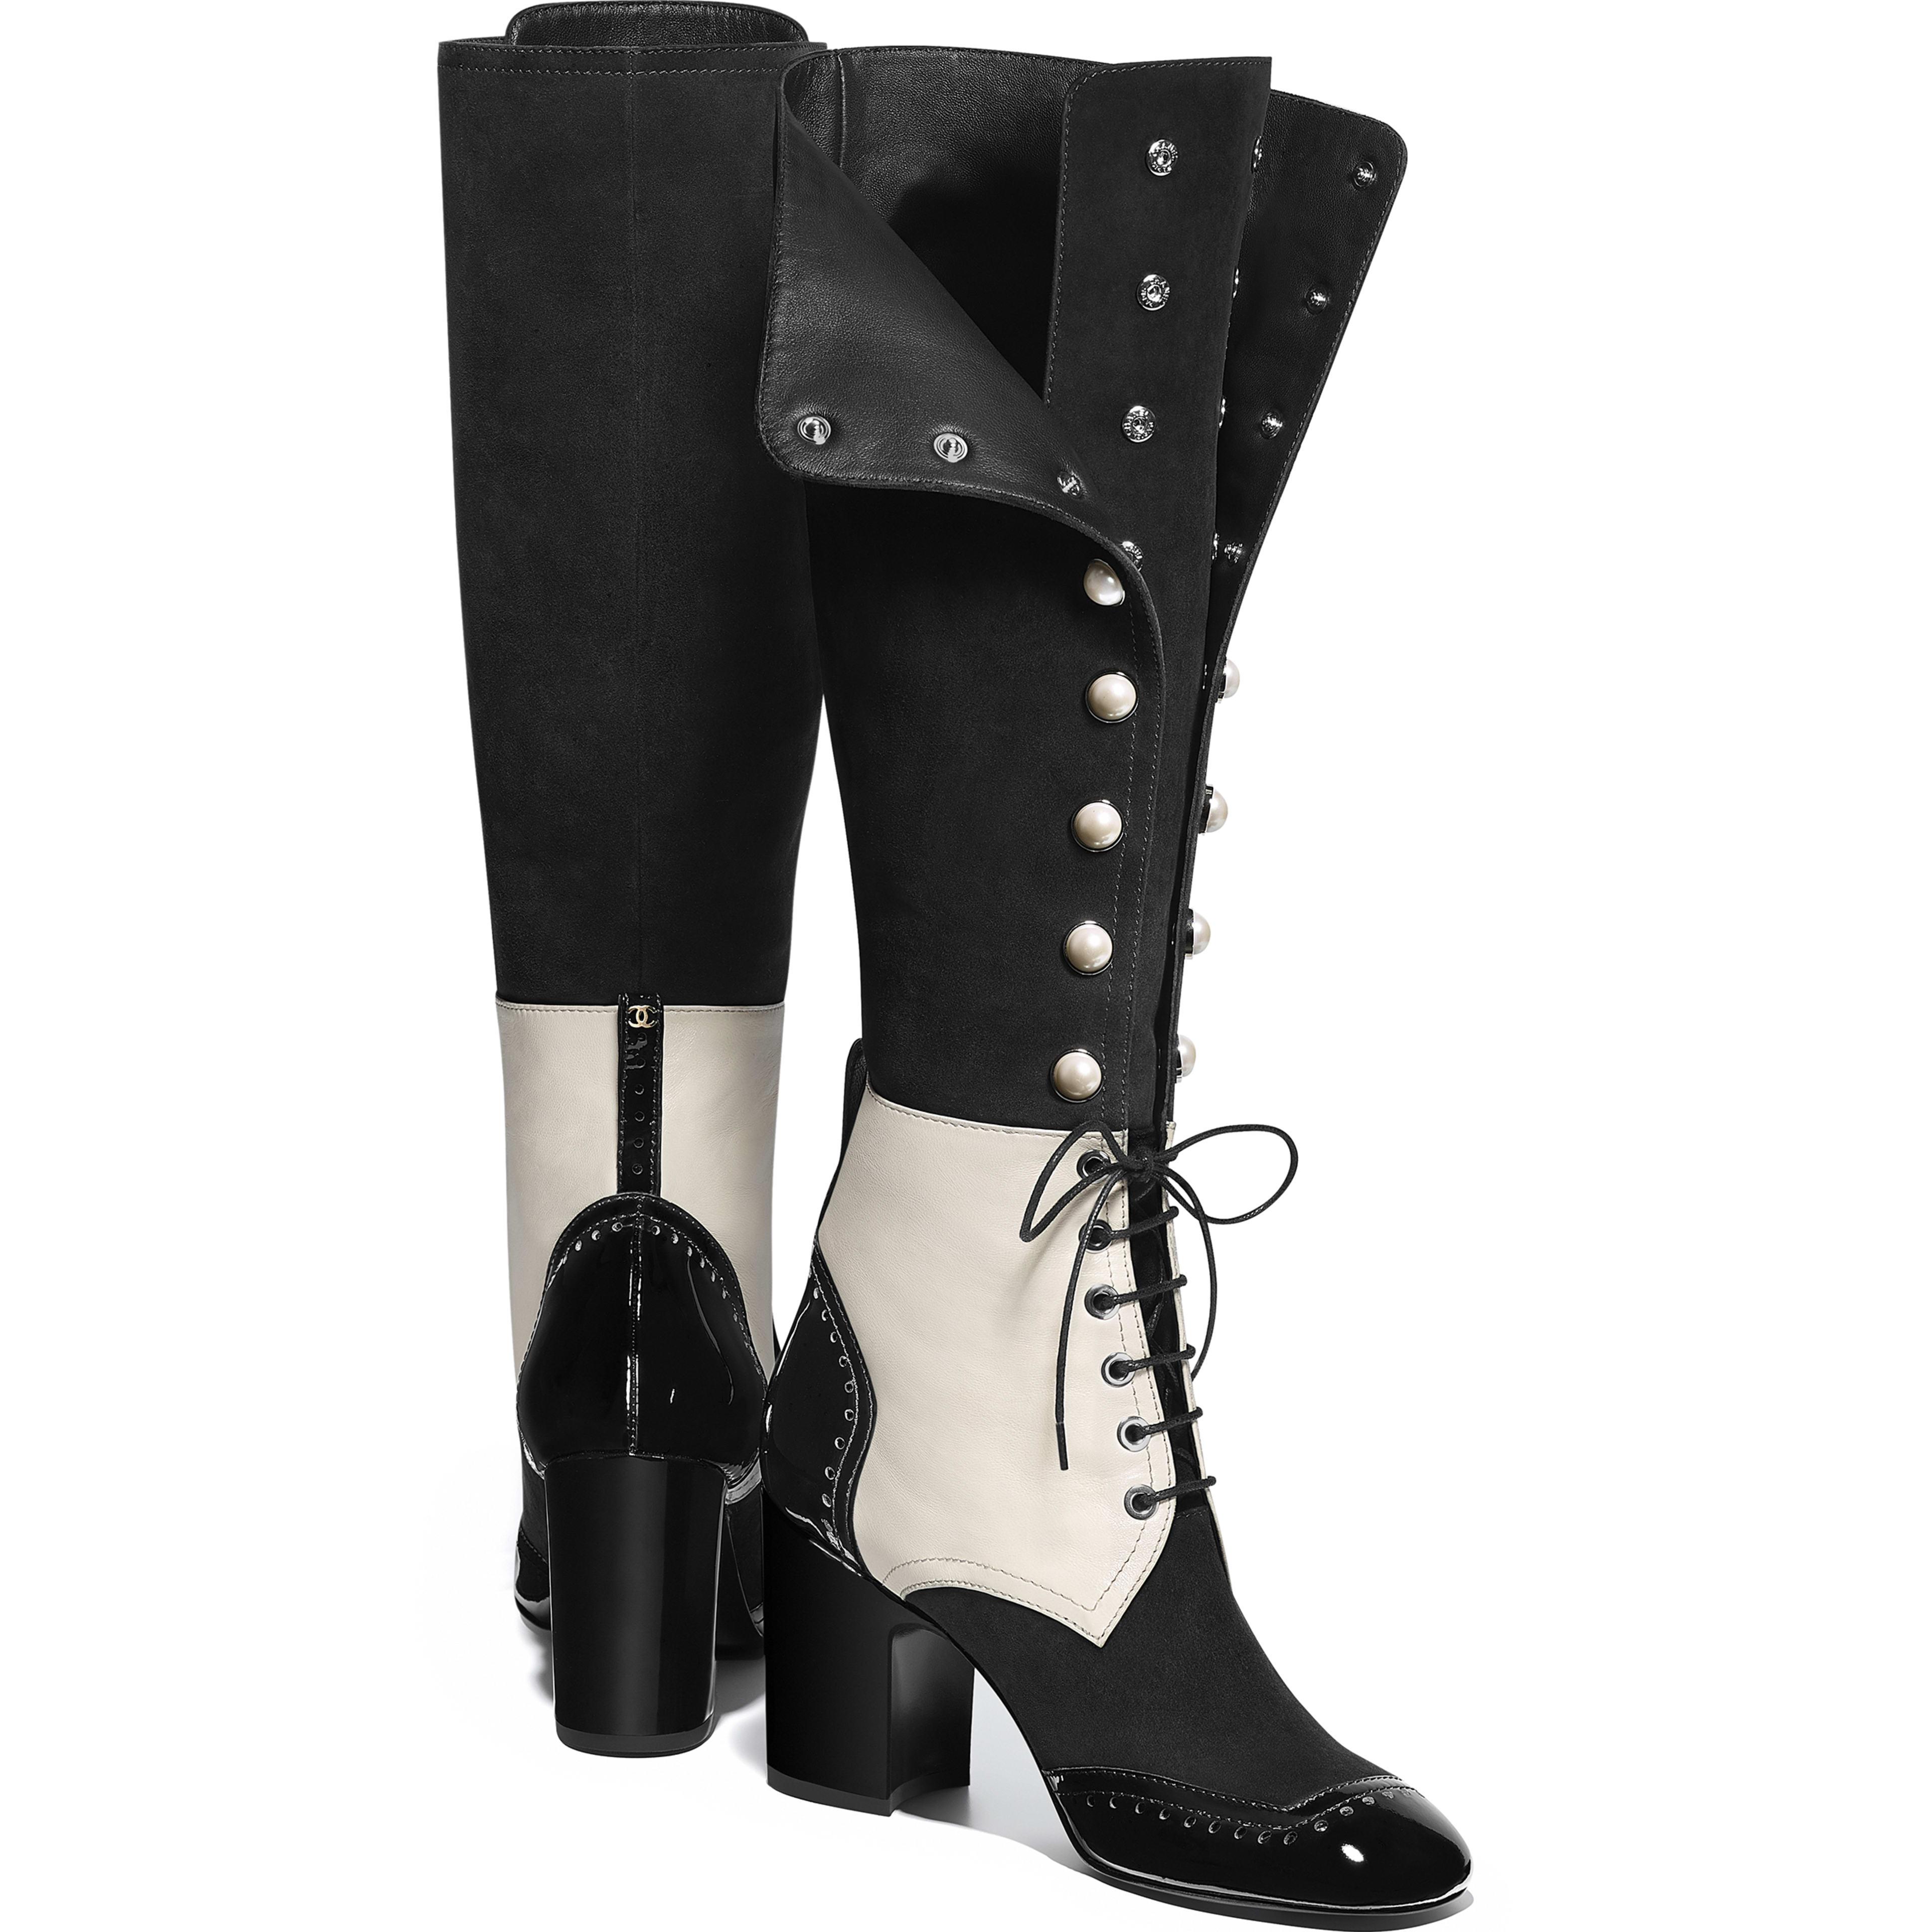 High Boots - Black & Ecru - Suede Goatskin, Lambskin & Patent Calfskin - Other view - see full sized version